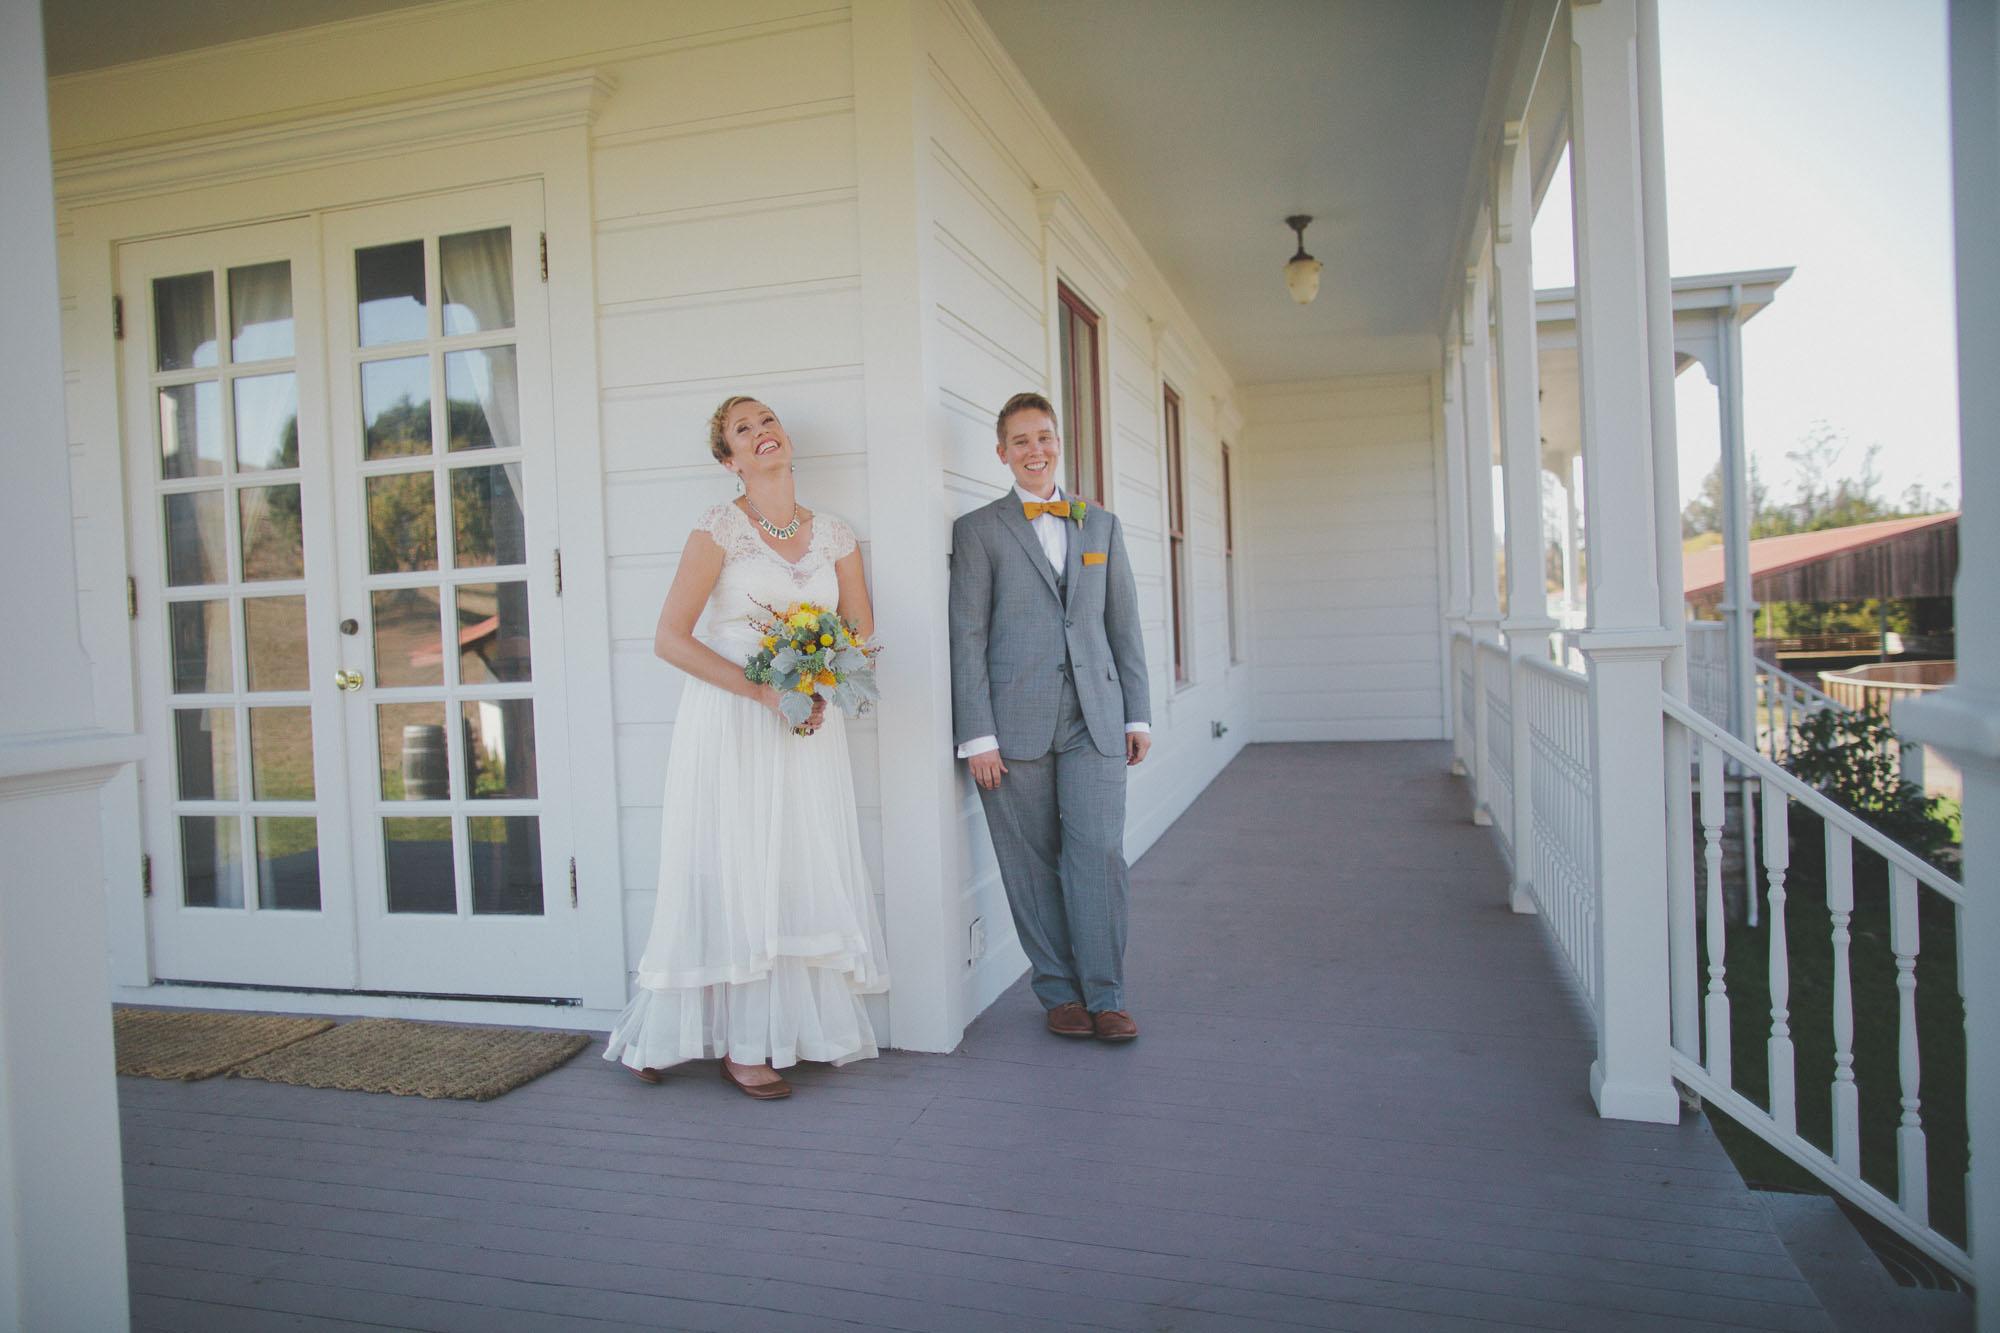 Gretchen_Gause_Petaluma_Olympias_Valley_Wedding_Photo-088.jpg